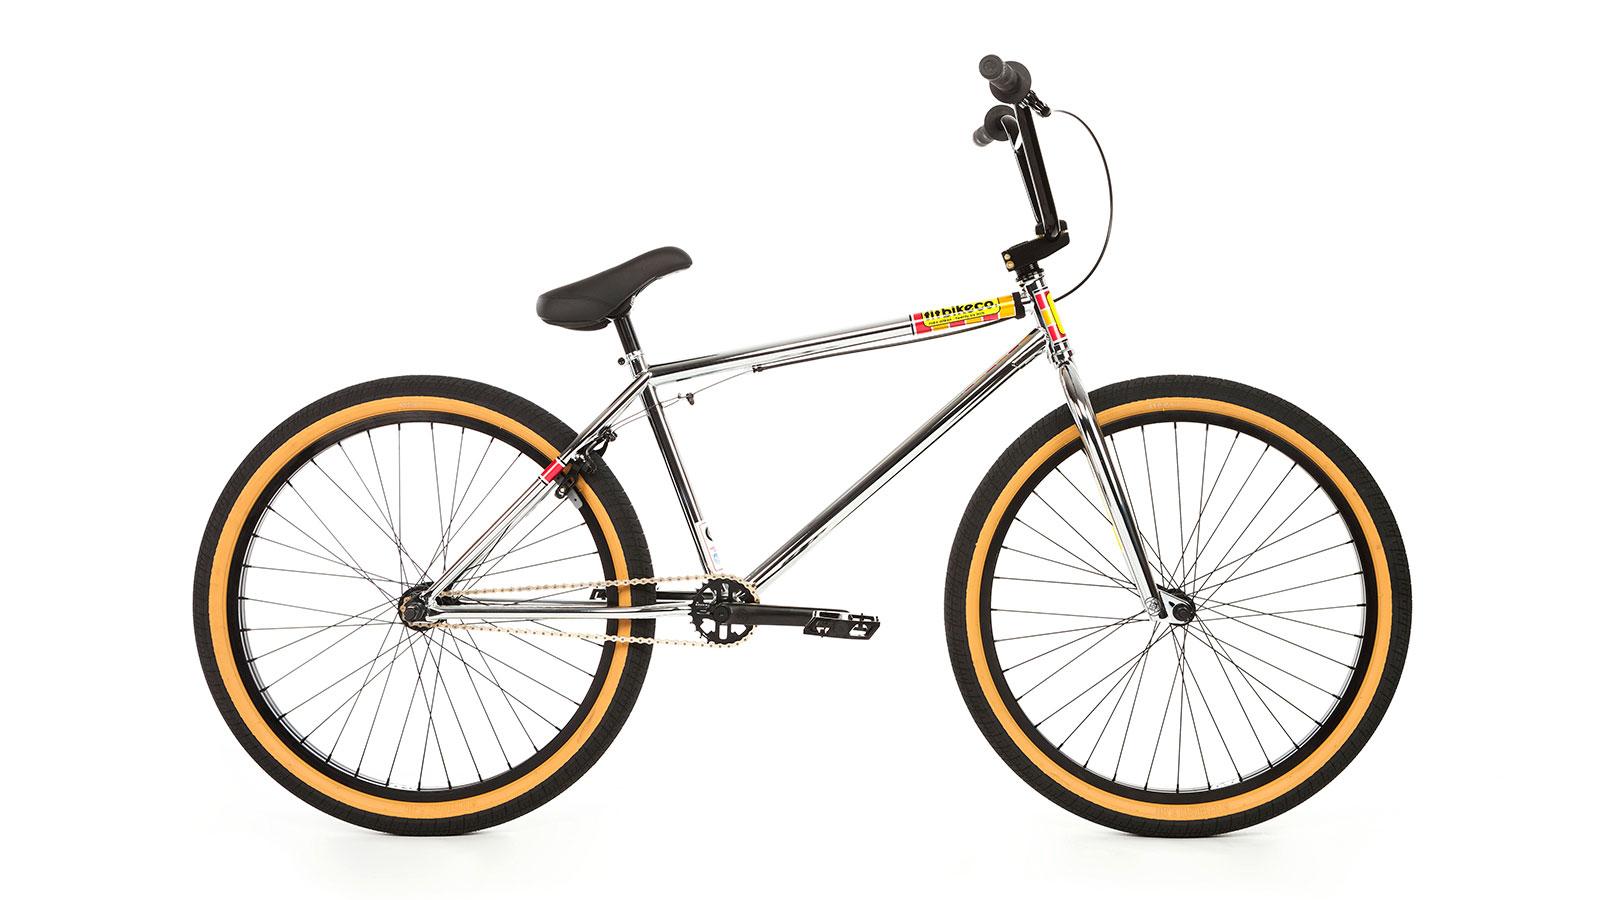 Replacement Black Fitbikeco BMX Stem Bolt